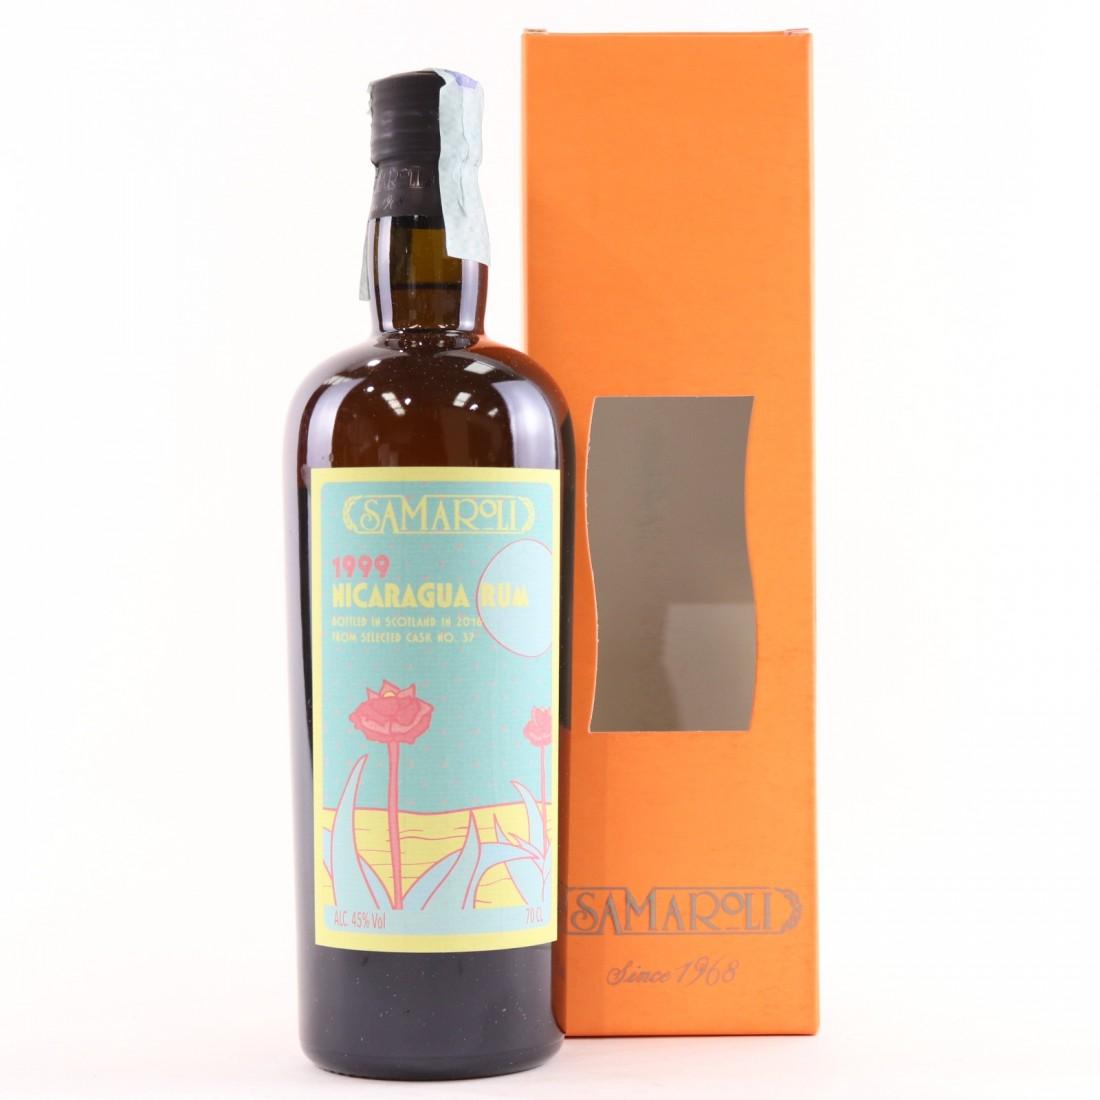 Nicaragua Rum 1999 Samaroli Single Cask